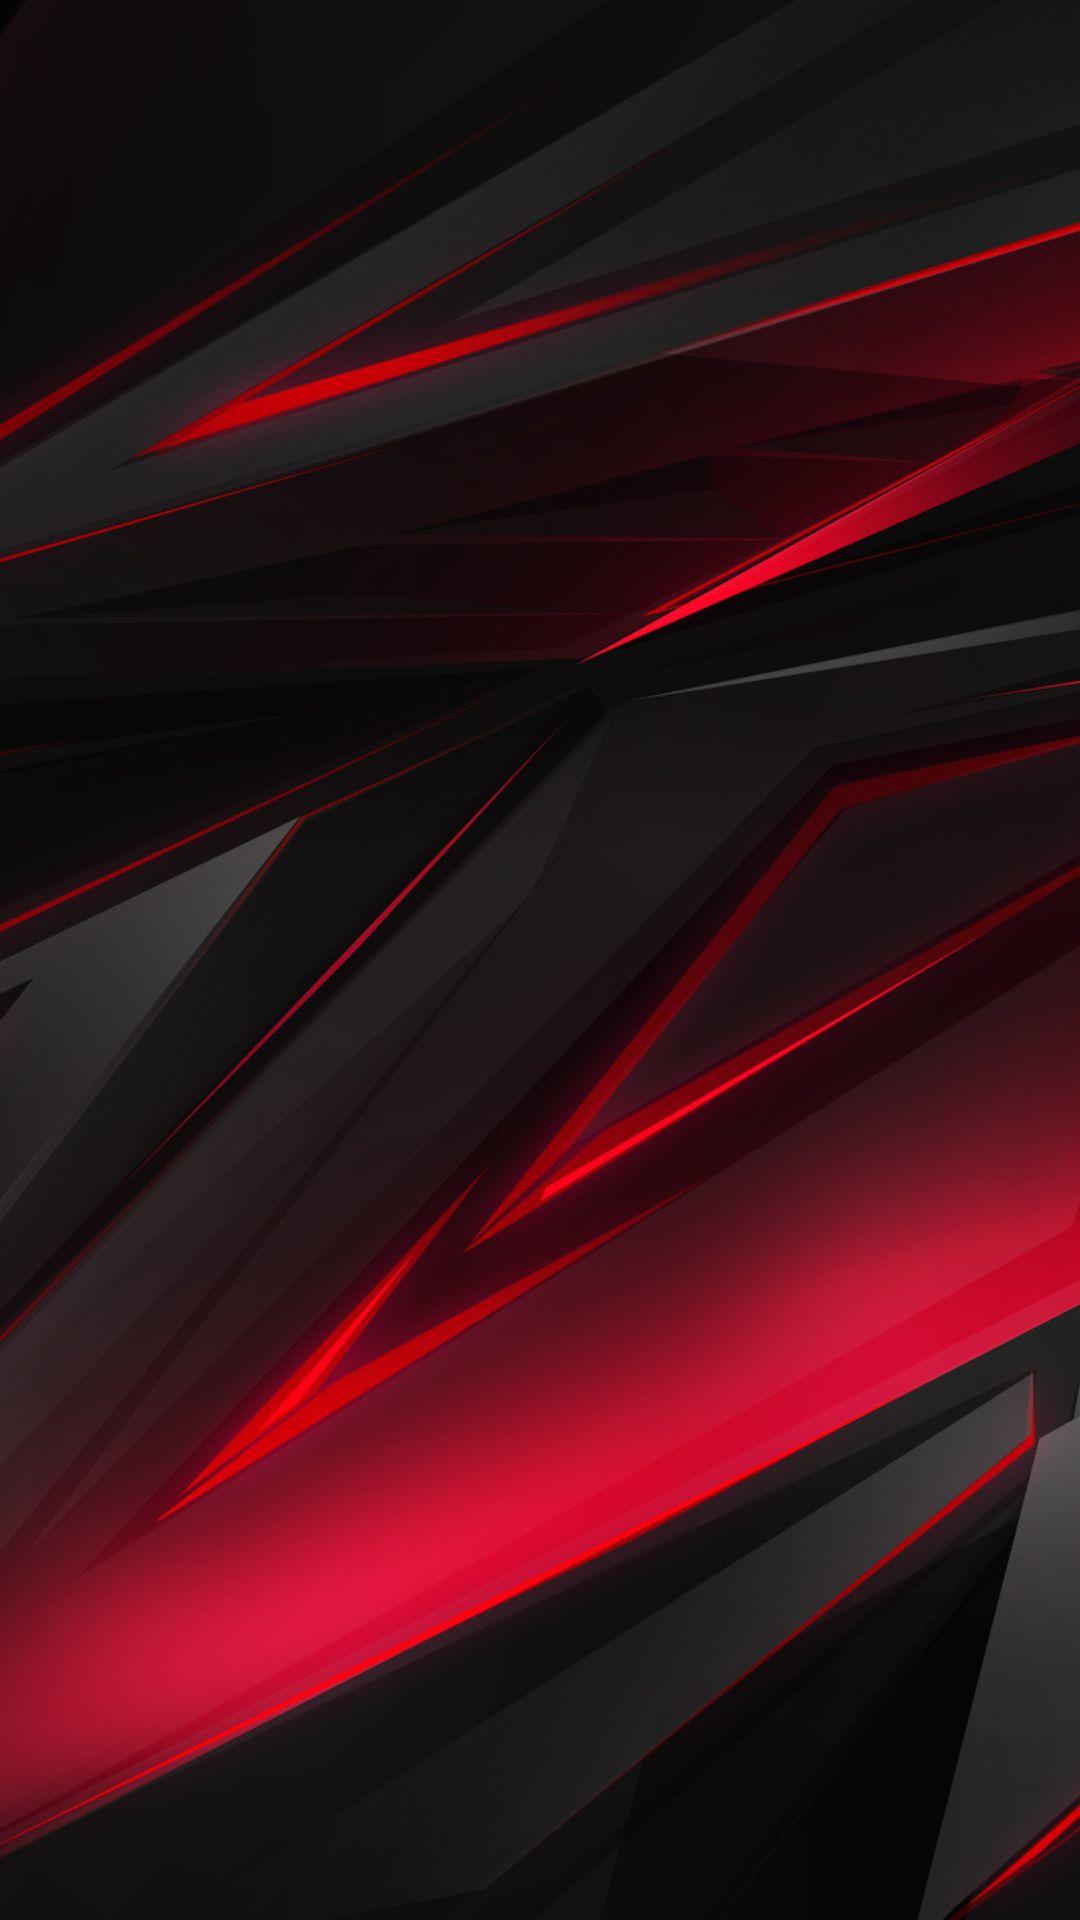 Polygonal Abstract Red Dark Iphone Xr Wallpaper In 2020 Cool Wallpapers For Phones Black Wallpaper Phone Wallpaper Design